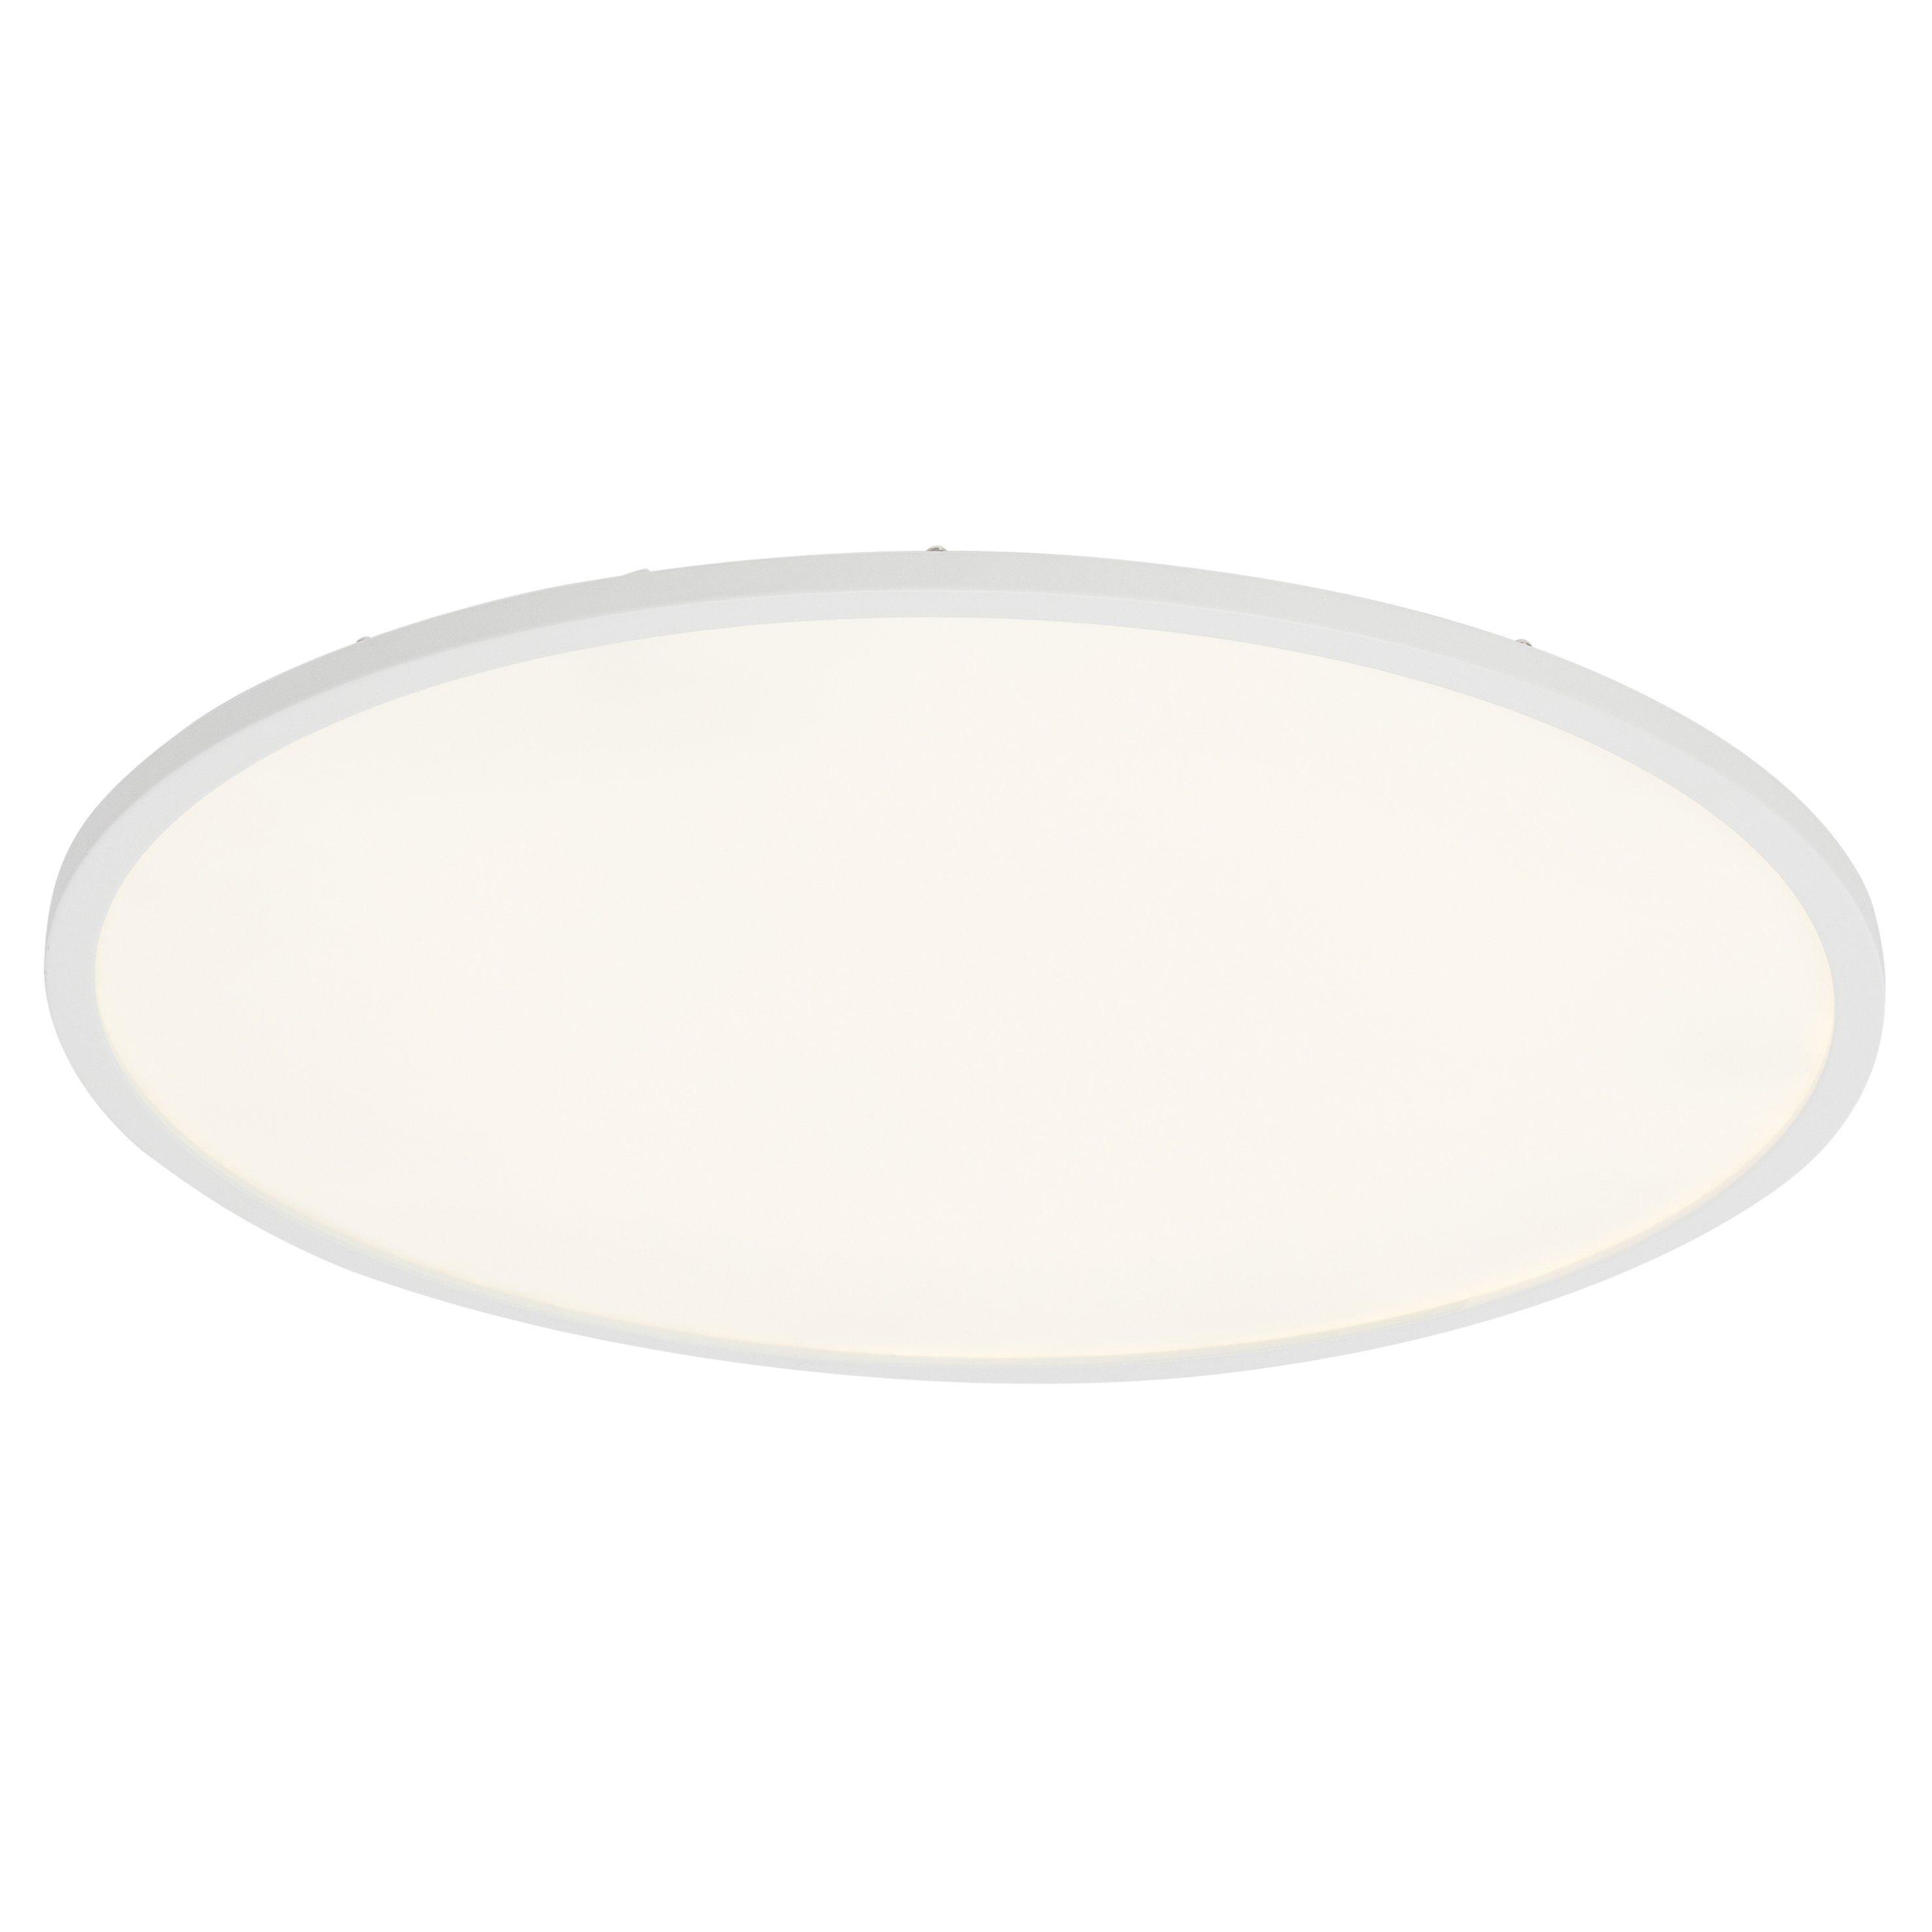 Brilliant Leuchten Ceres LED Deckenaufbau-Paneel 45cm weiß easyDim